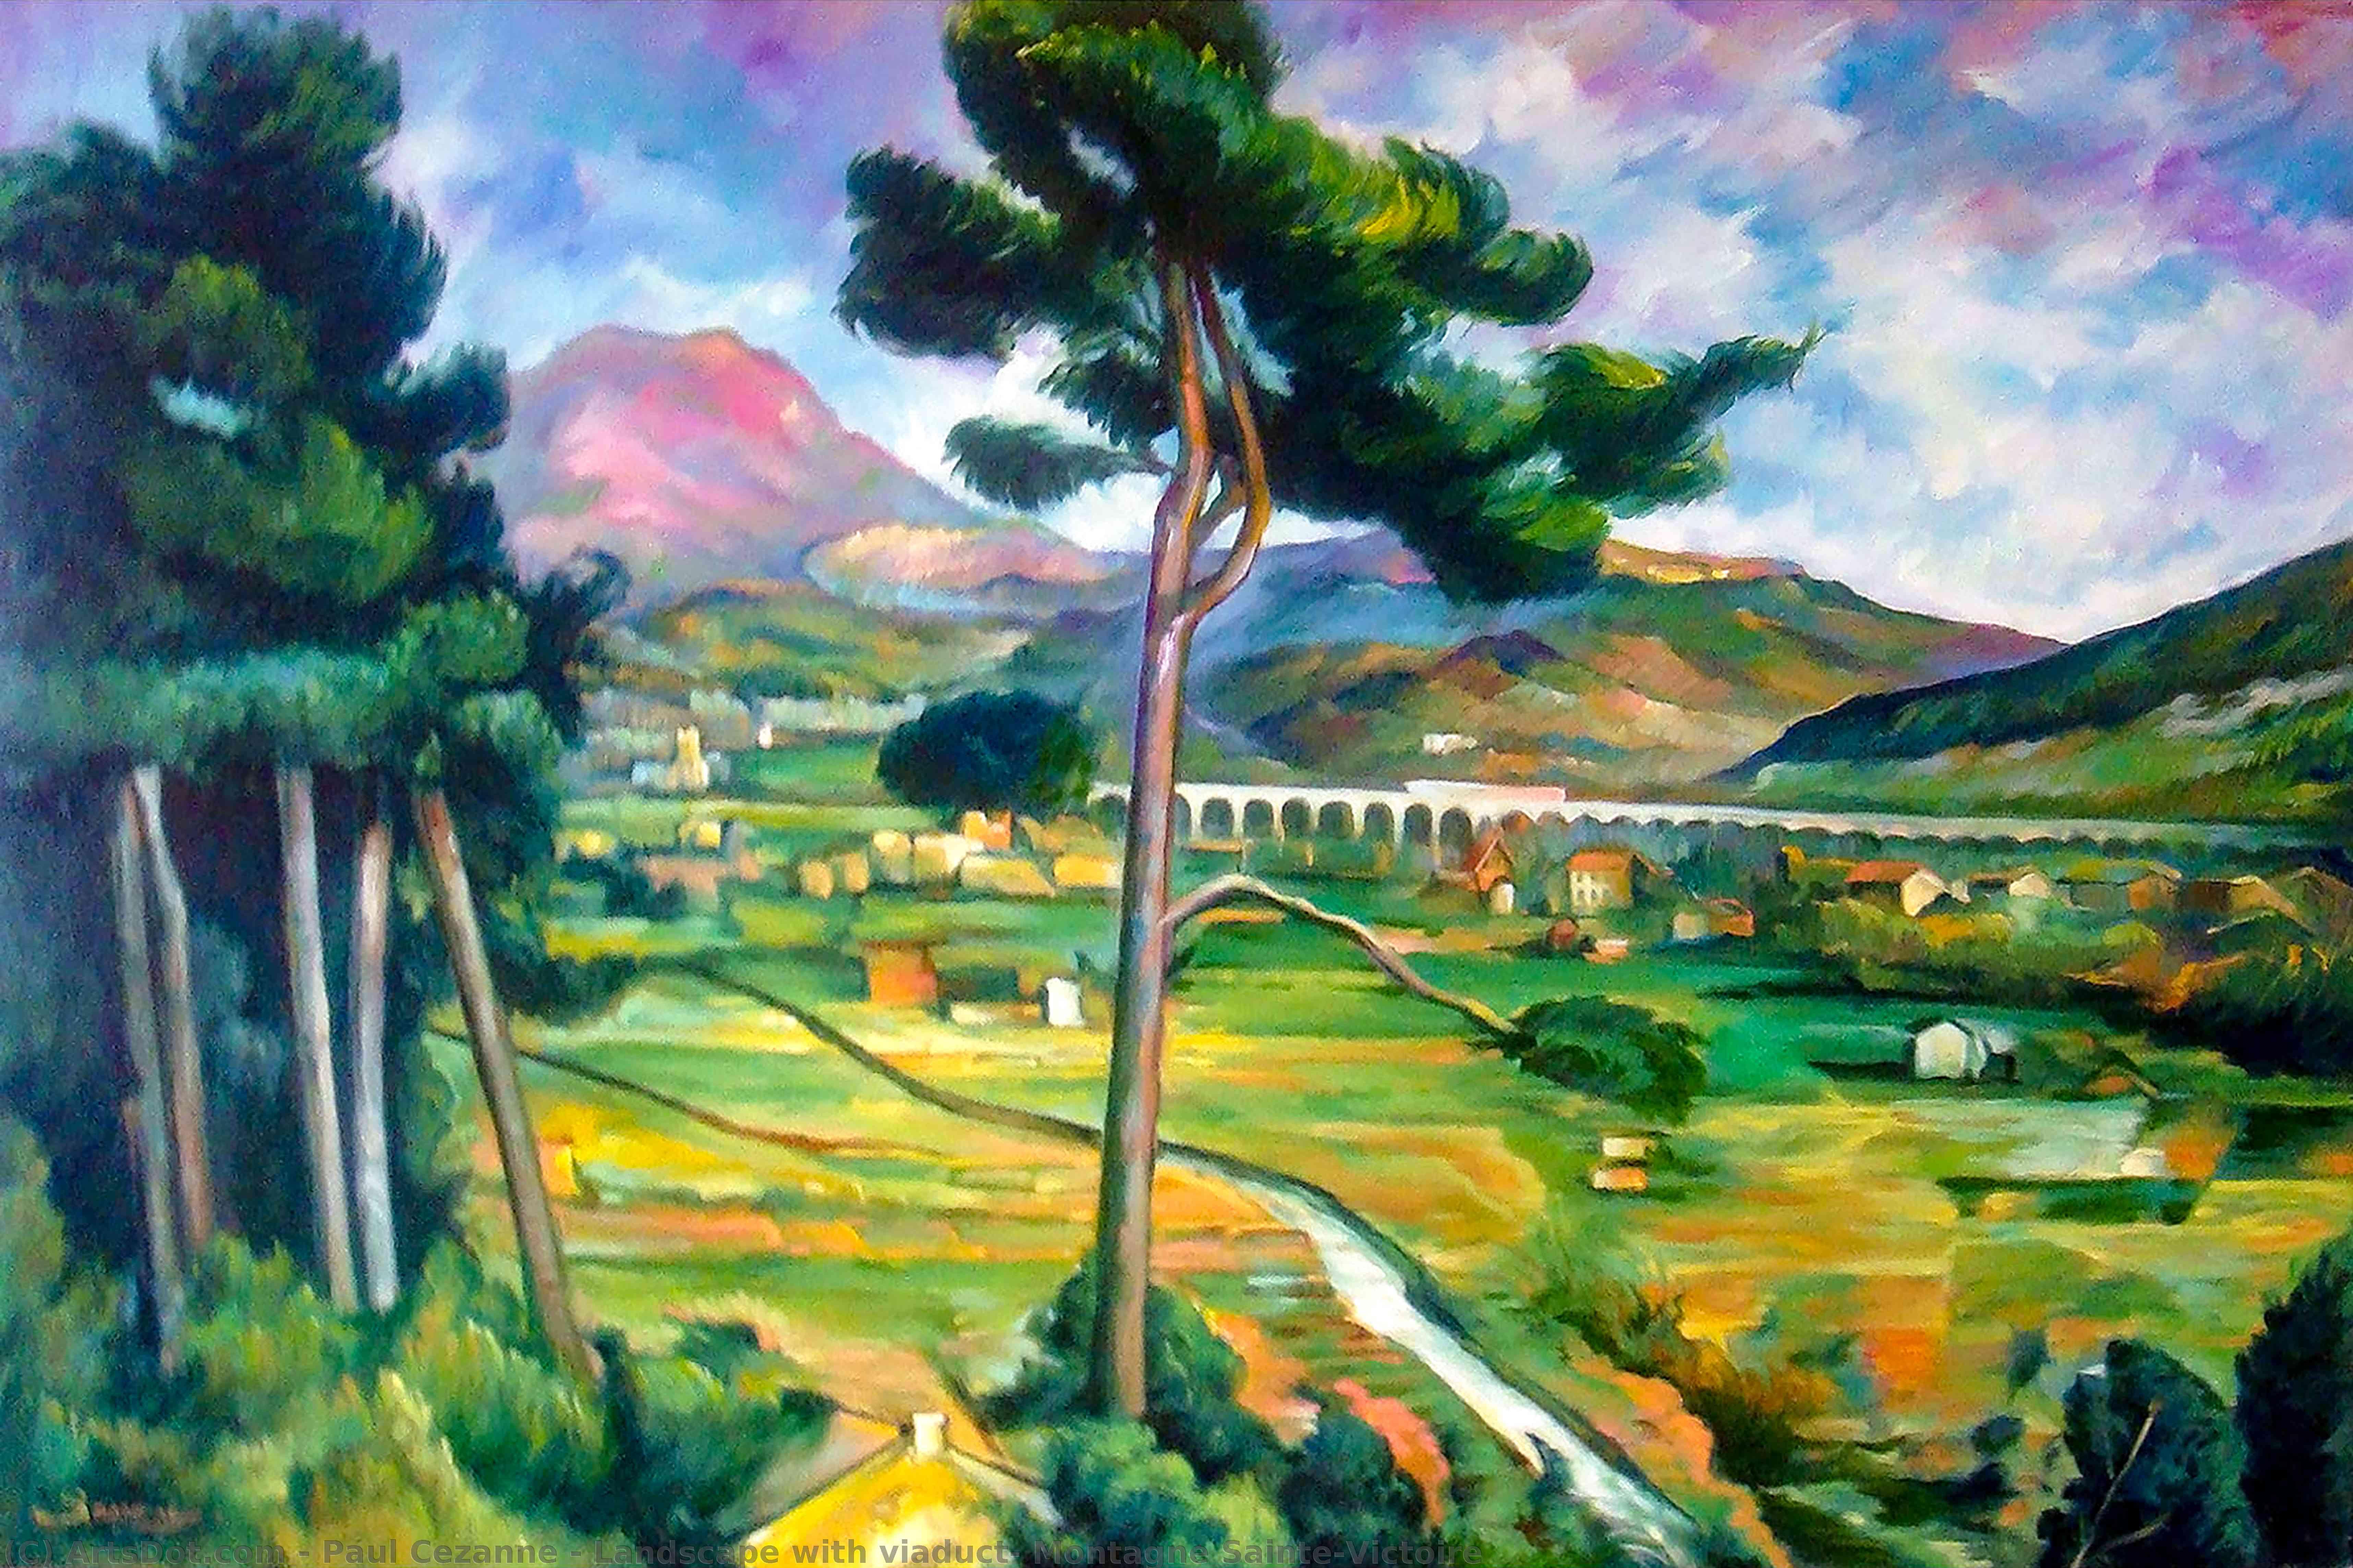 WikiOO.org - Güzel Sanatlar Ansiklopedisi - Resim, Resimler Paul Cezanne - Landscape with viaduct: Montagne Sainte-Victoire